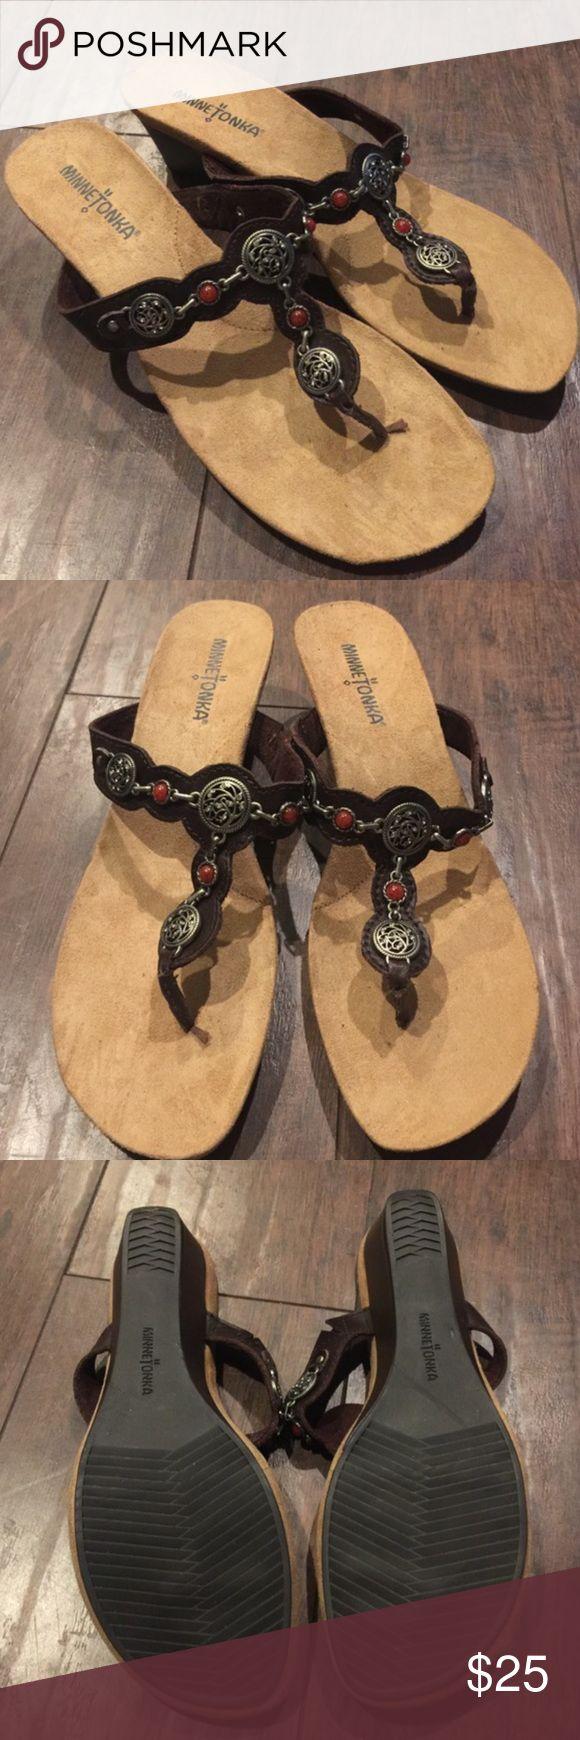 🎉Sale🎉 New Minnetonka Sandals New without box Minnetonka sandals size 8 Minnetonka Shoes Sandals